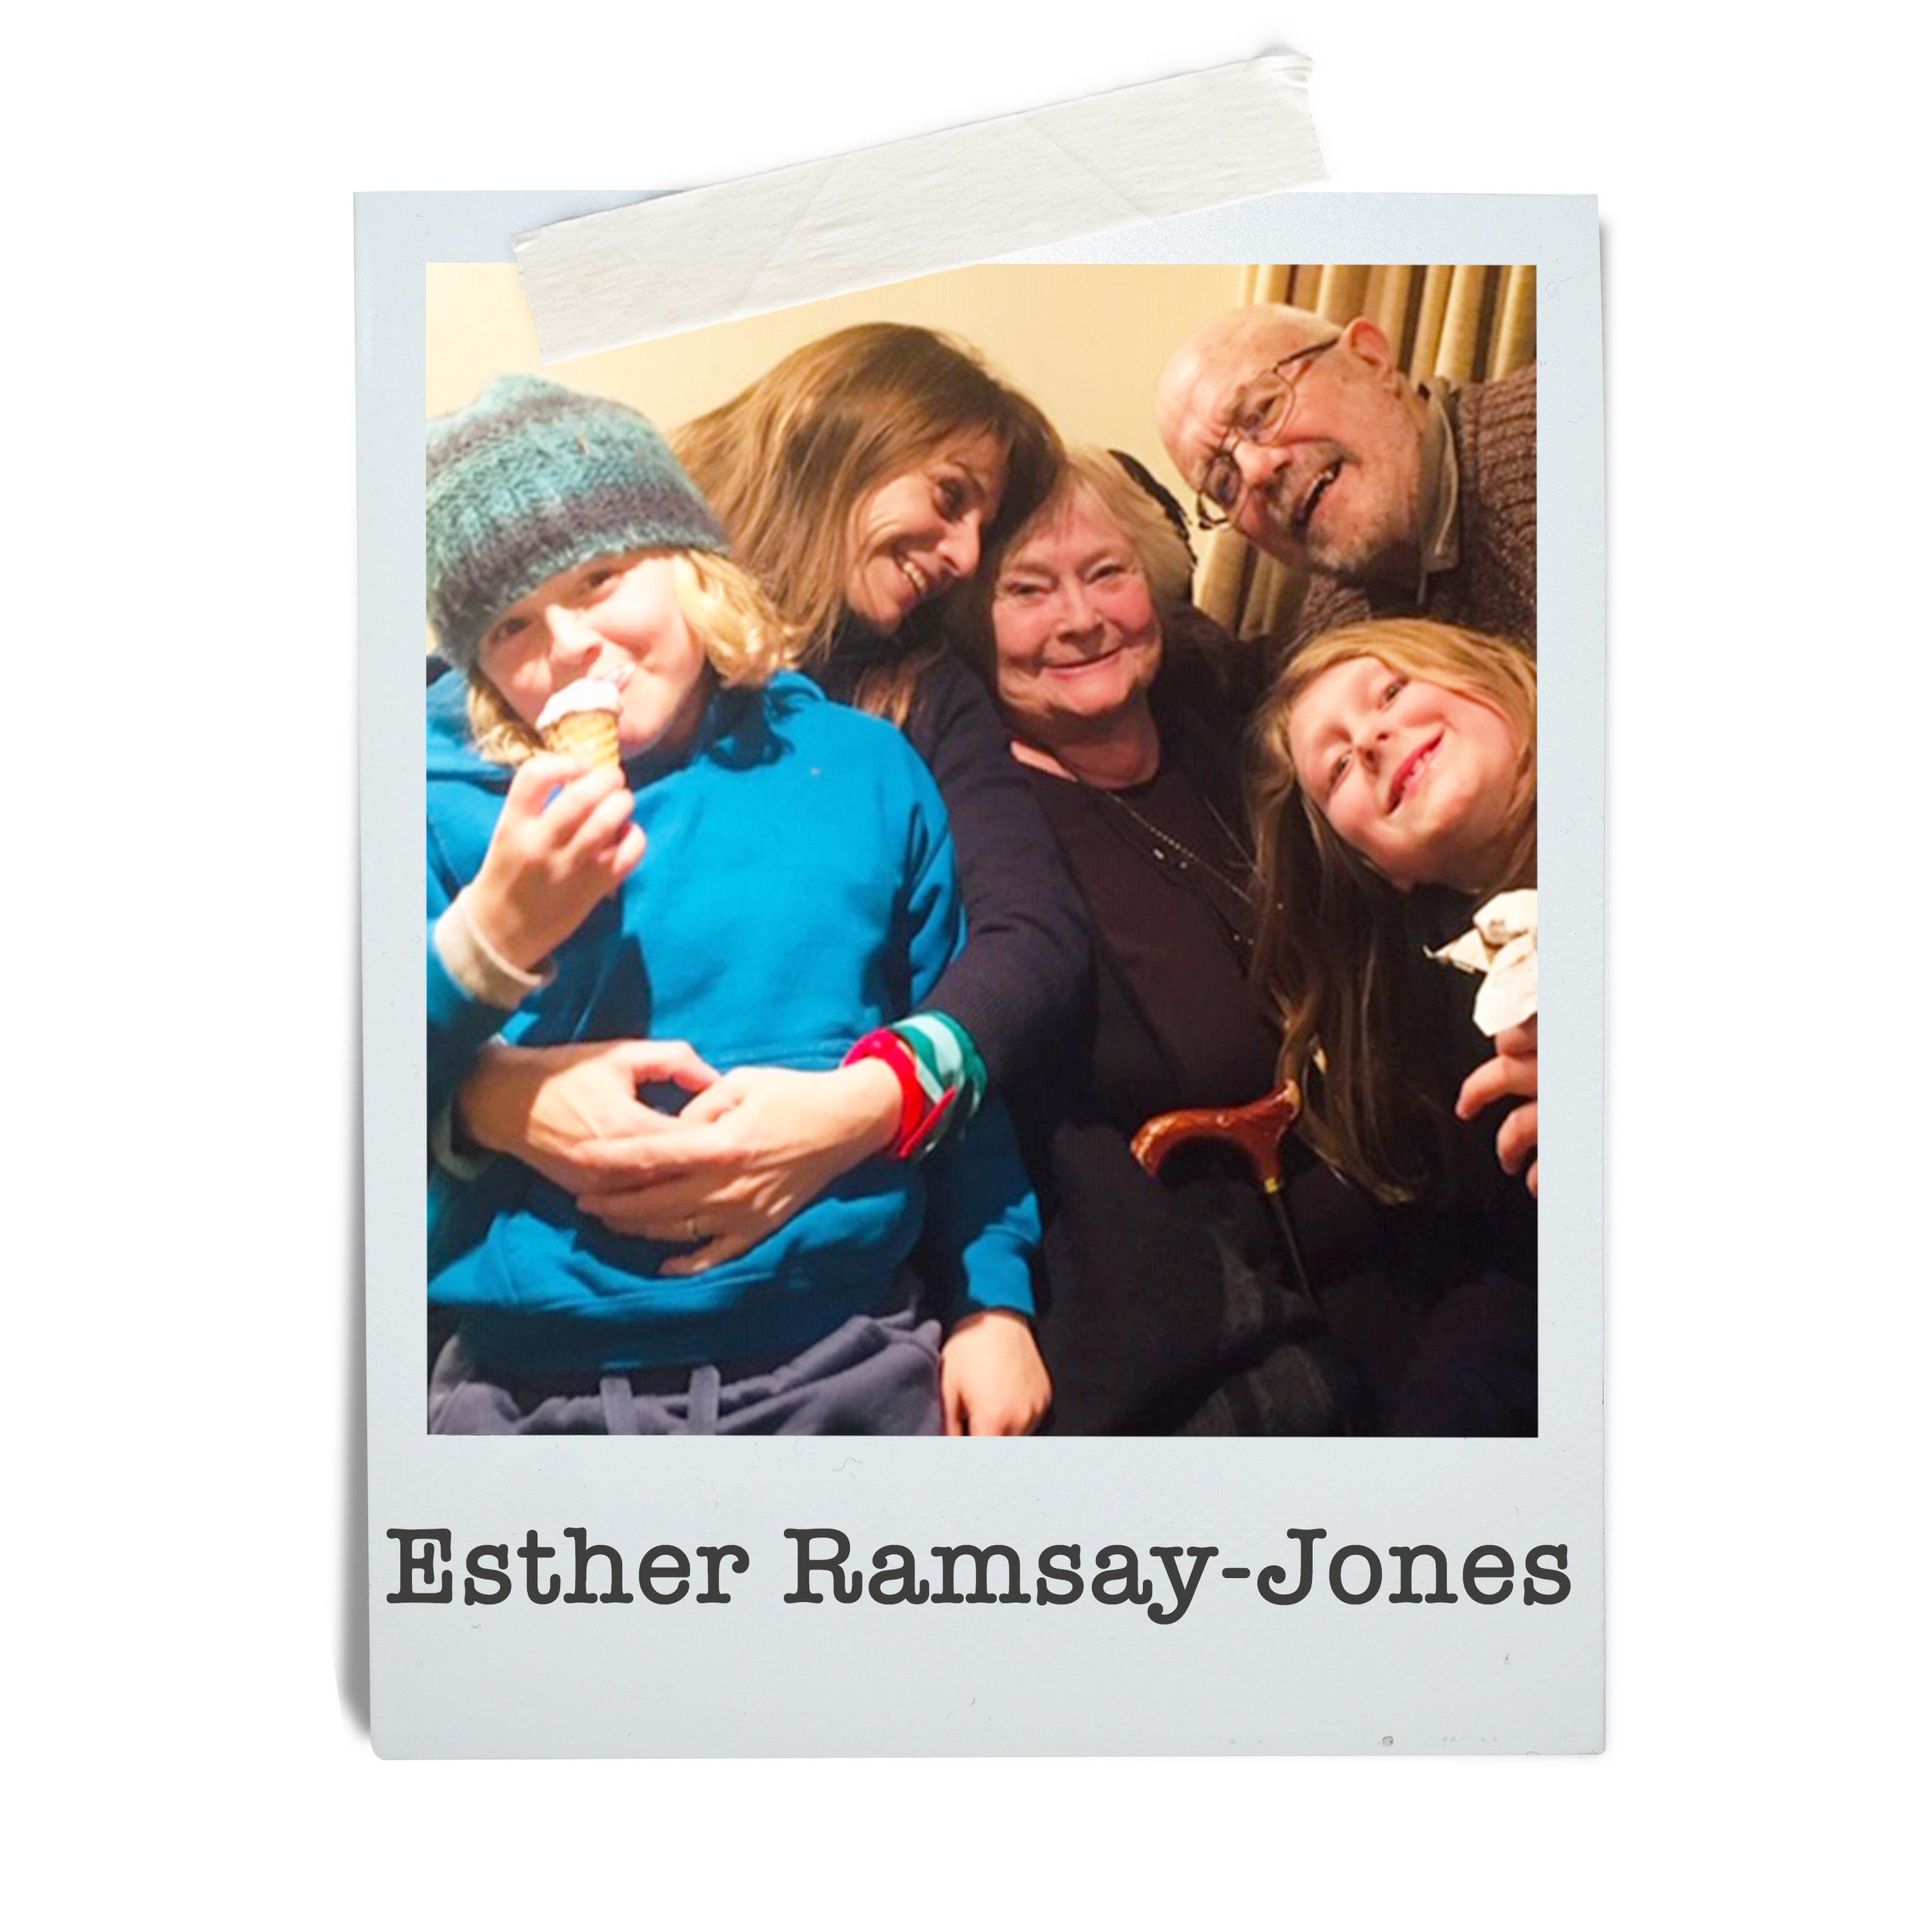 Esther Ramsay-Jones